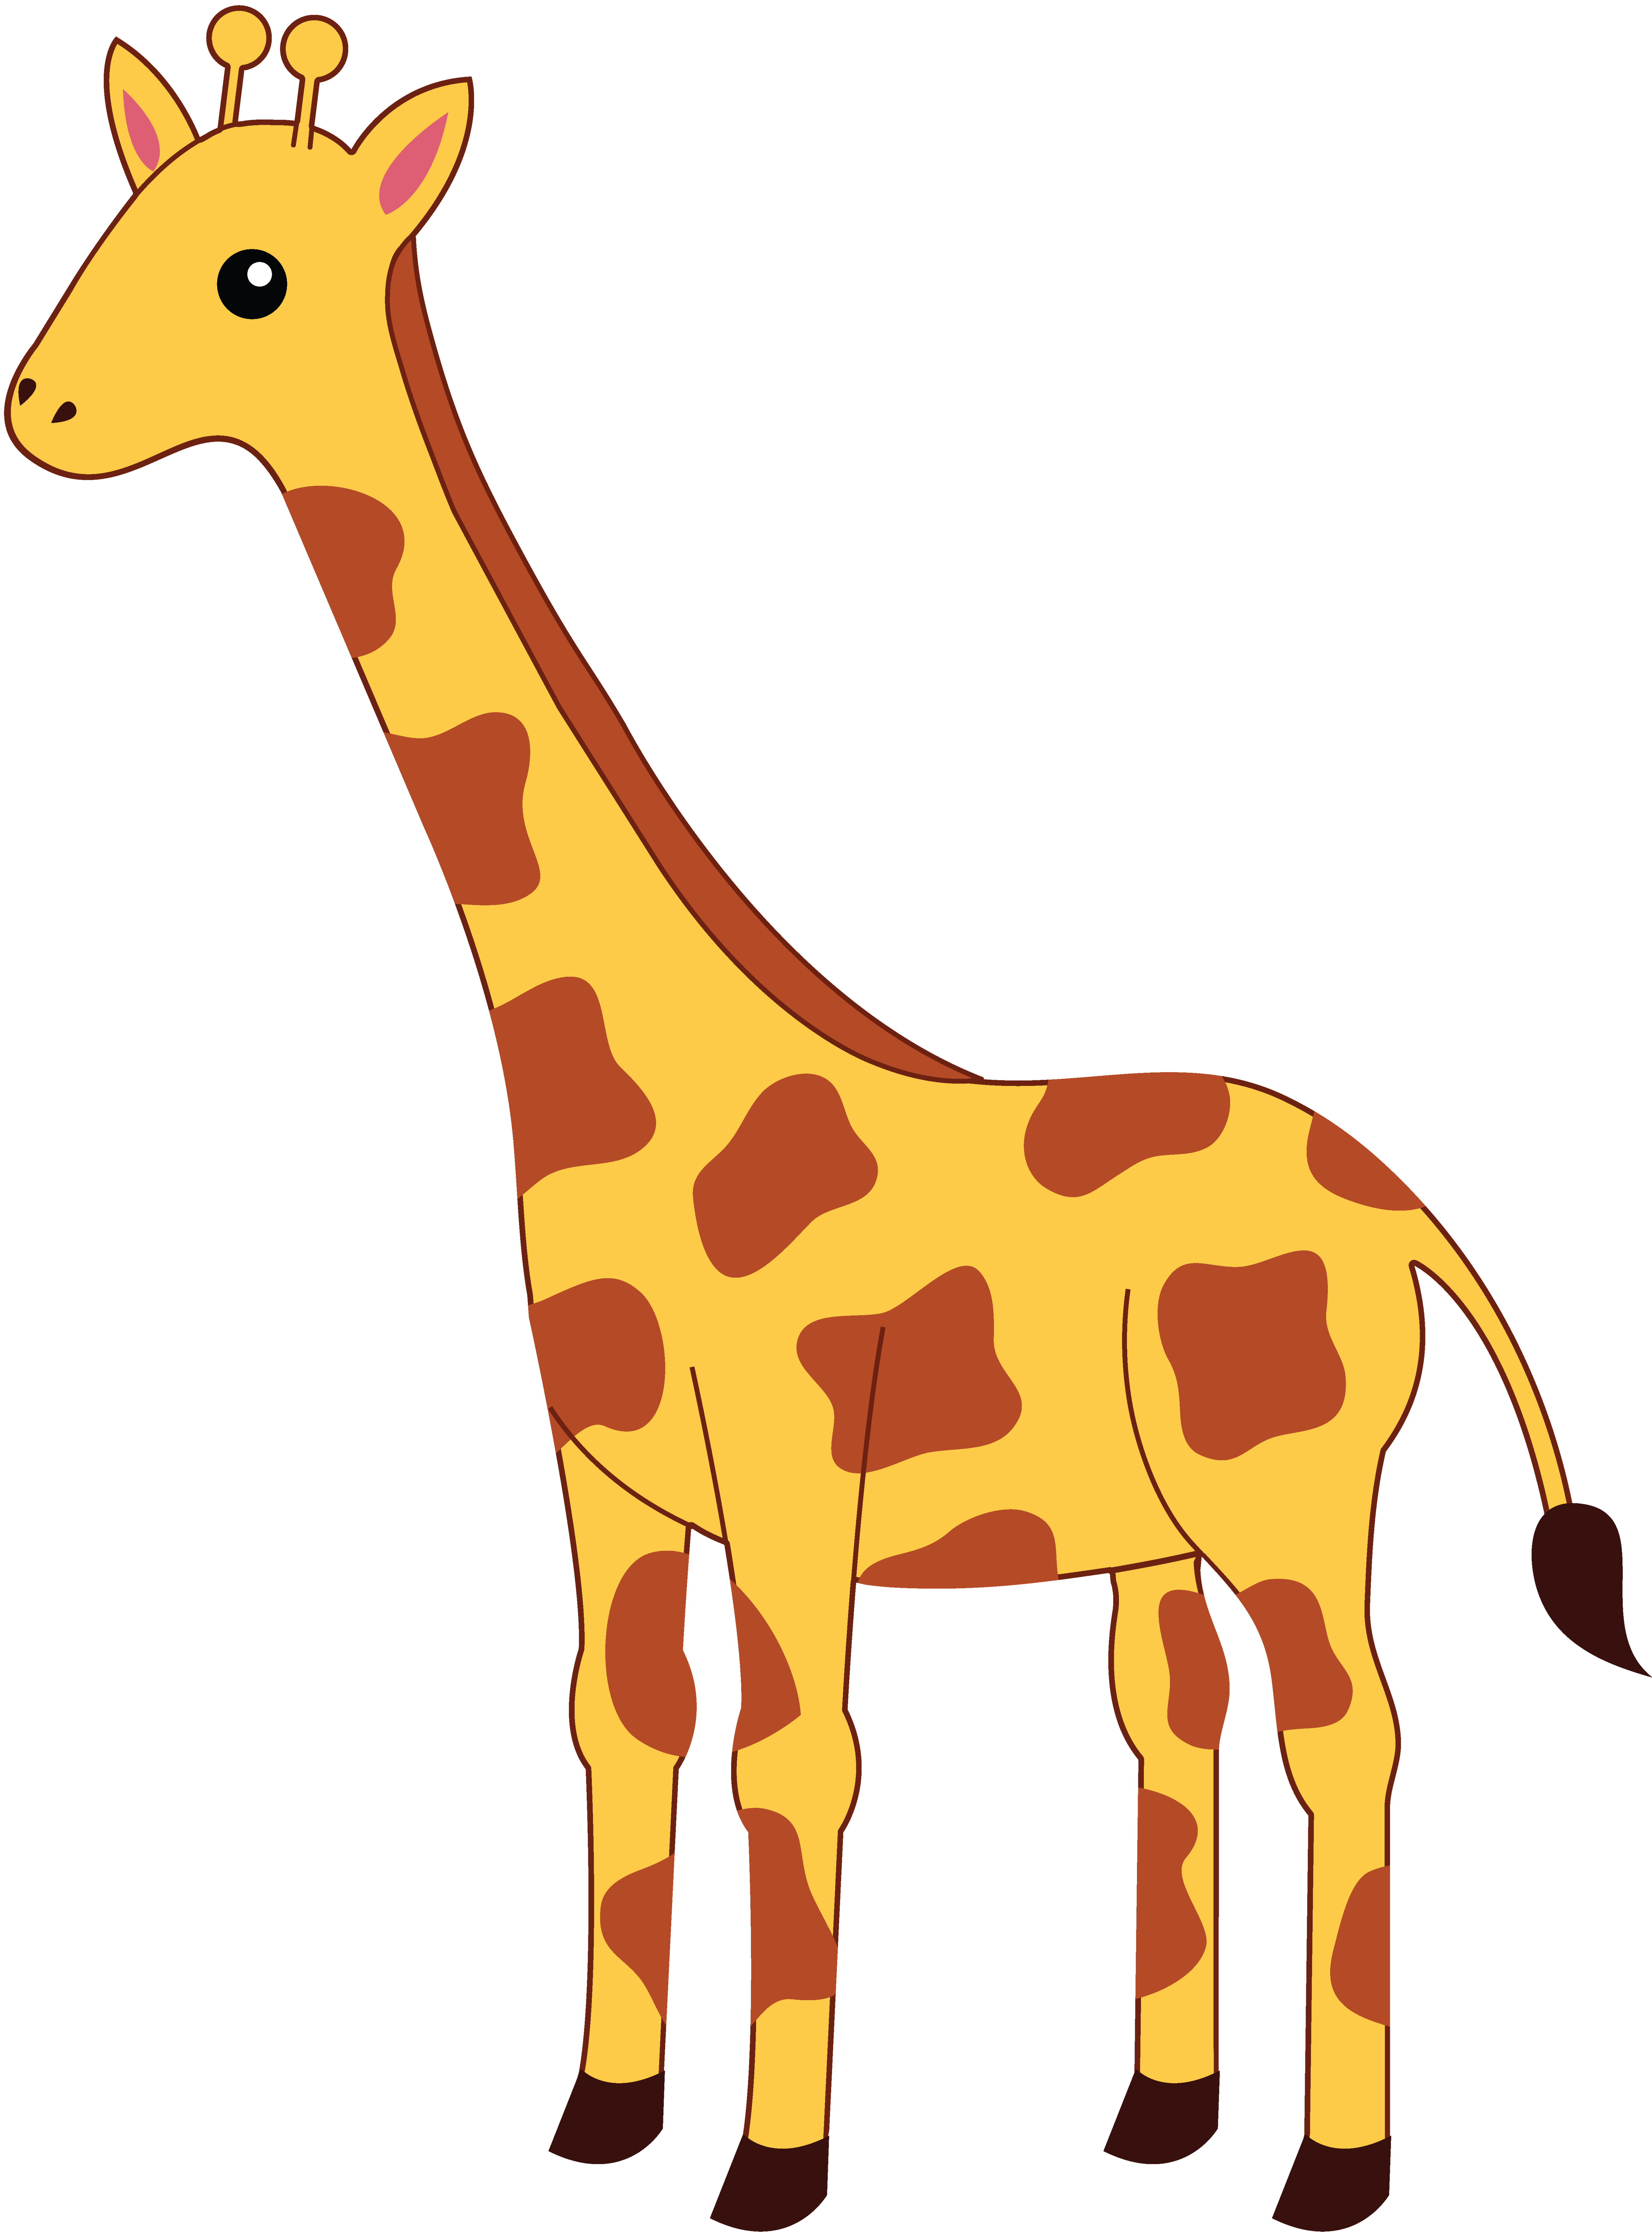 Top free image . Giraffe clipart